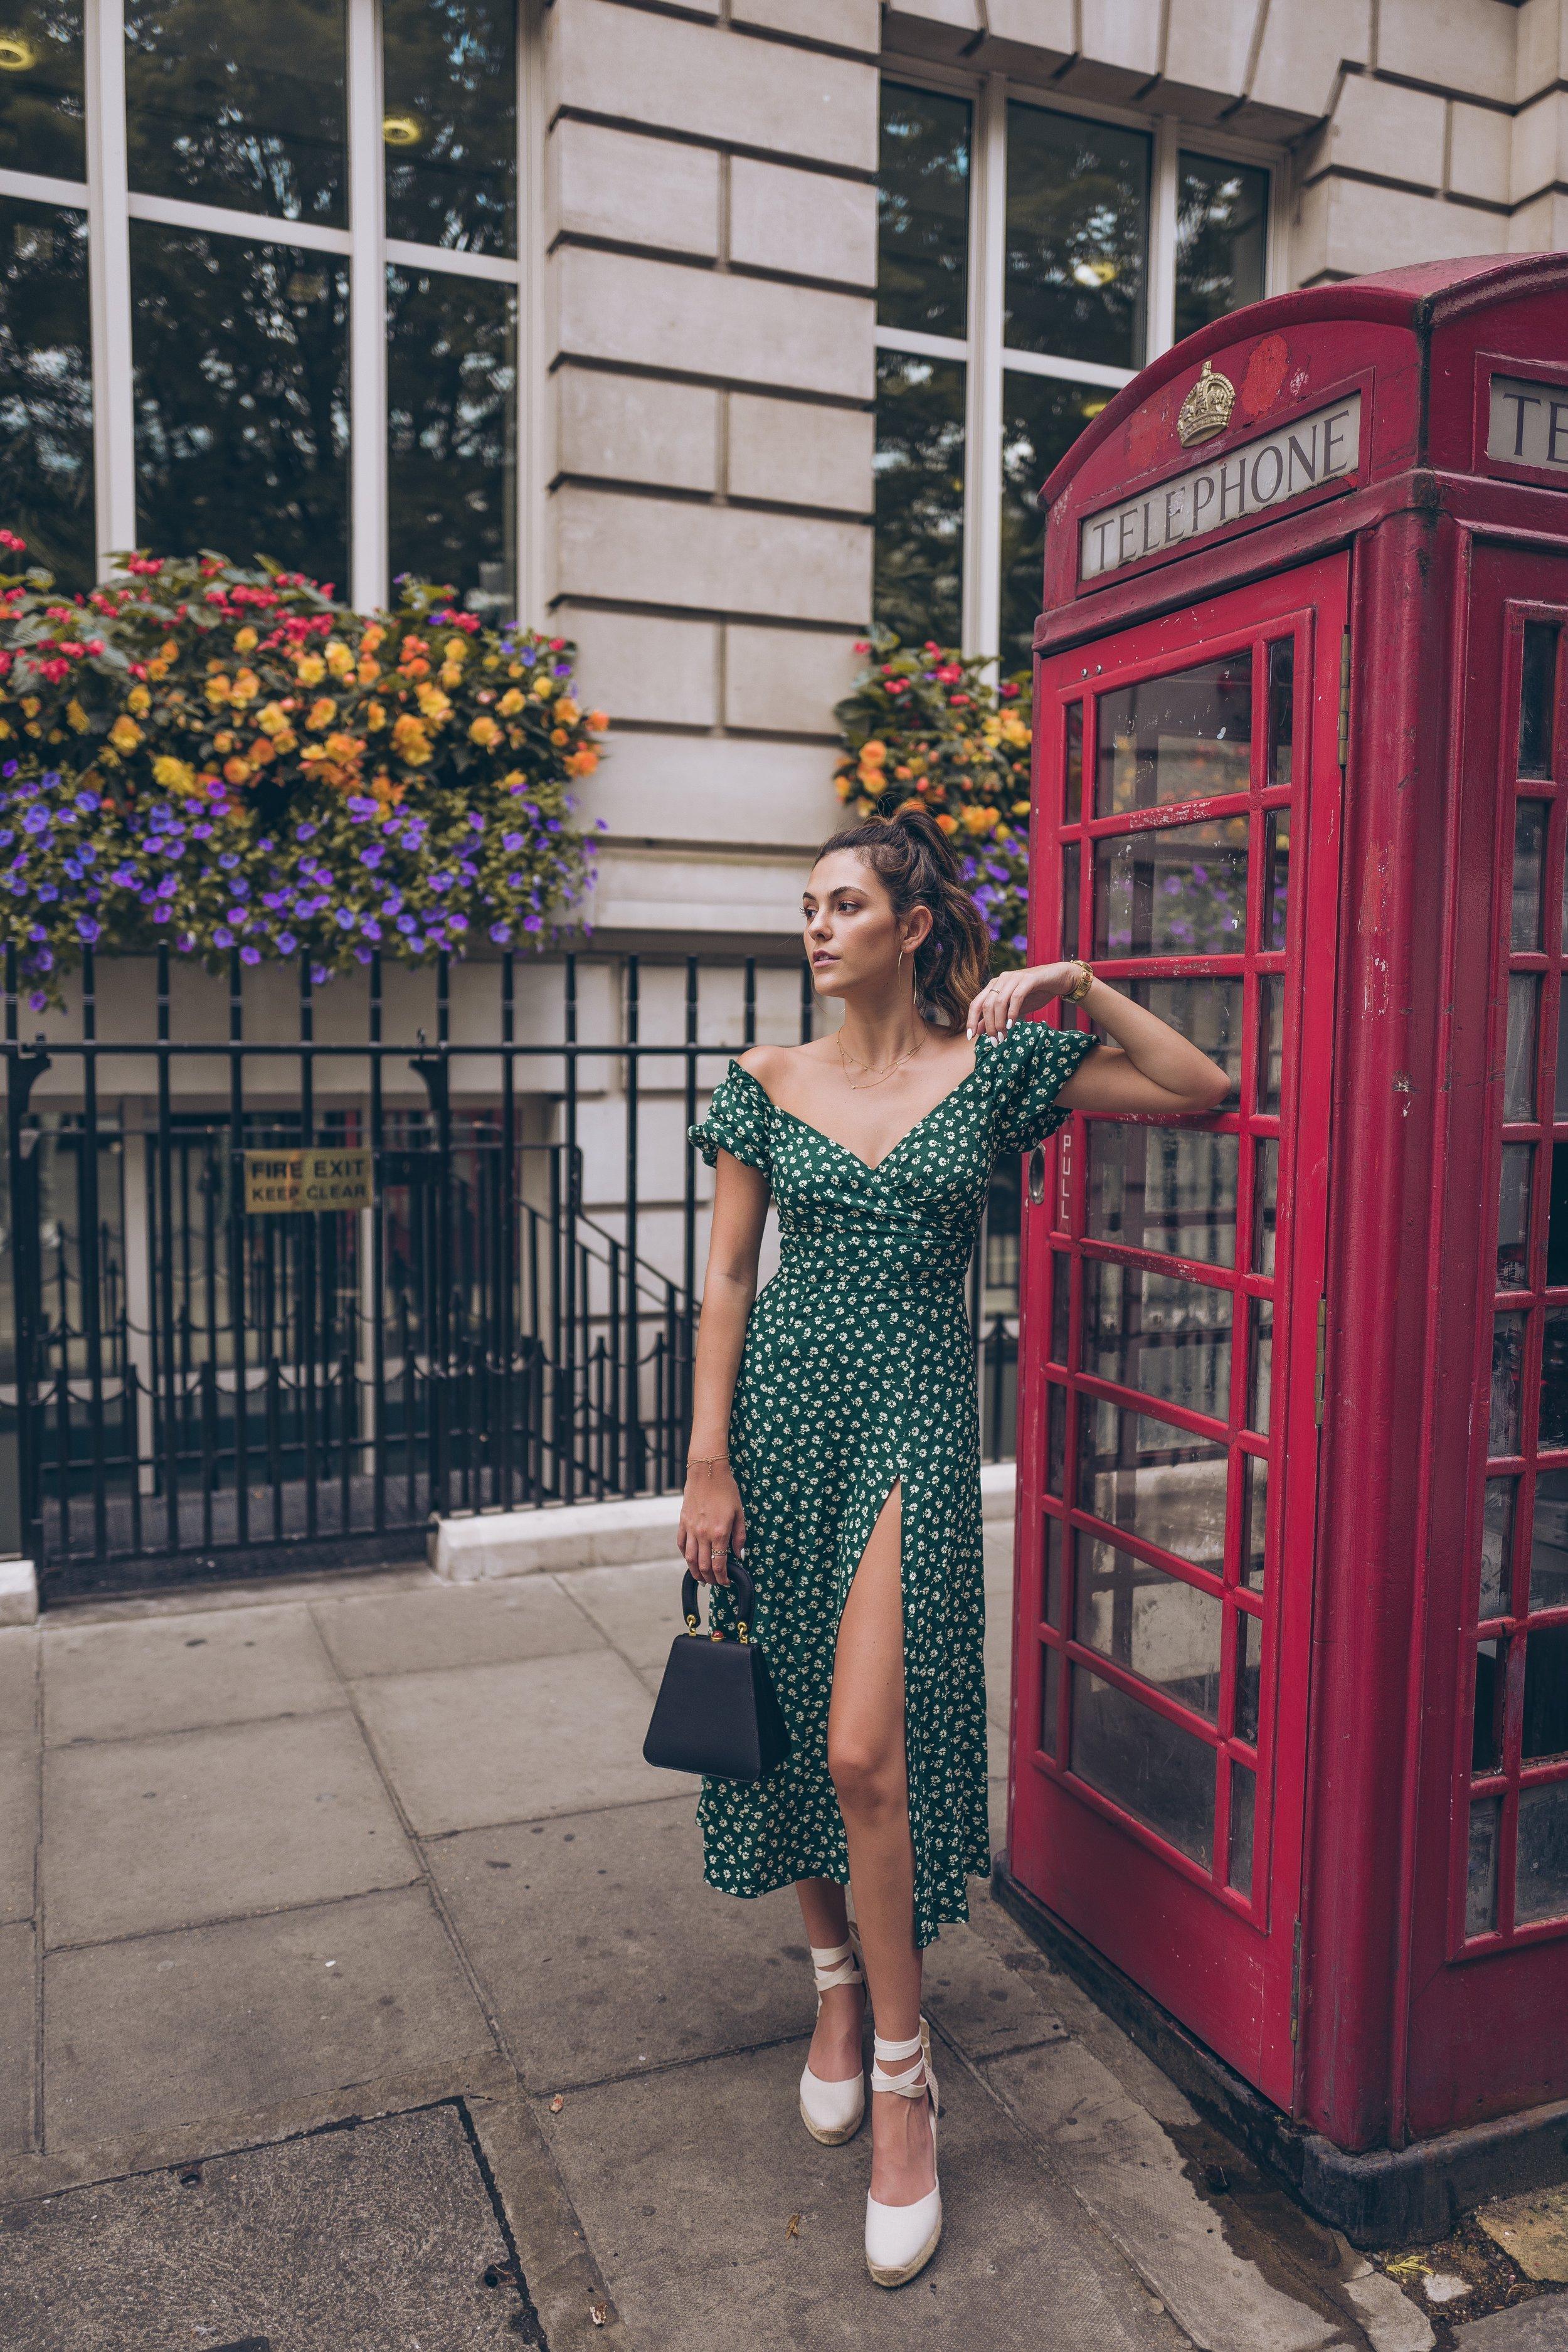 Julia friedman London reformation dress Piccadilly Circus